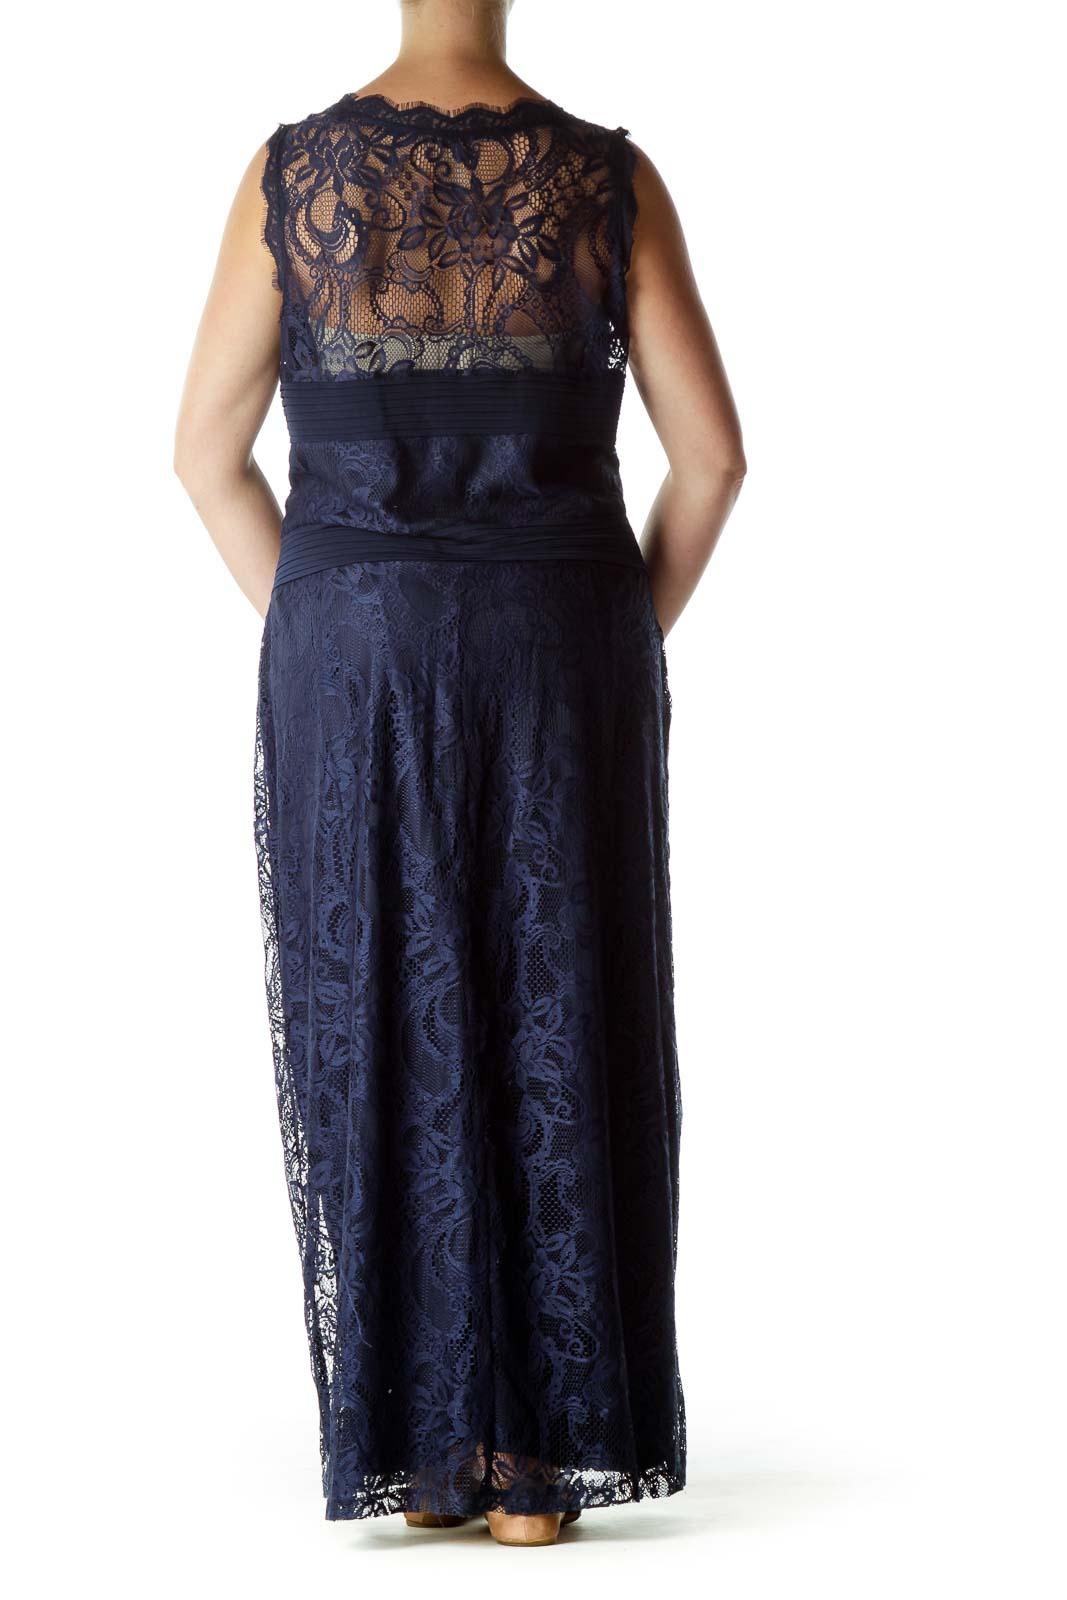 5679dc7d82 Wristwatch by Versace. Next. Candalite Women s. Navy Lace Sleeveless Maxi  Dress